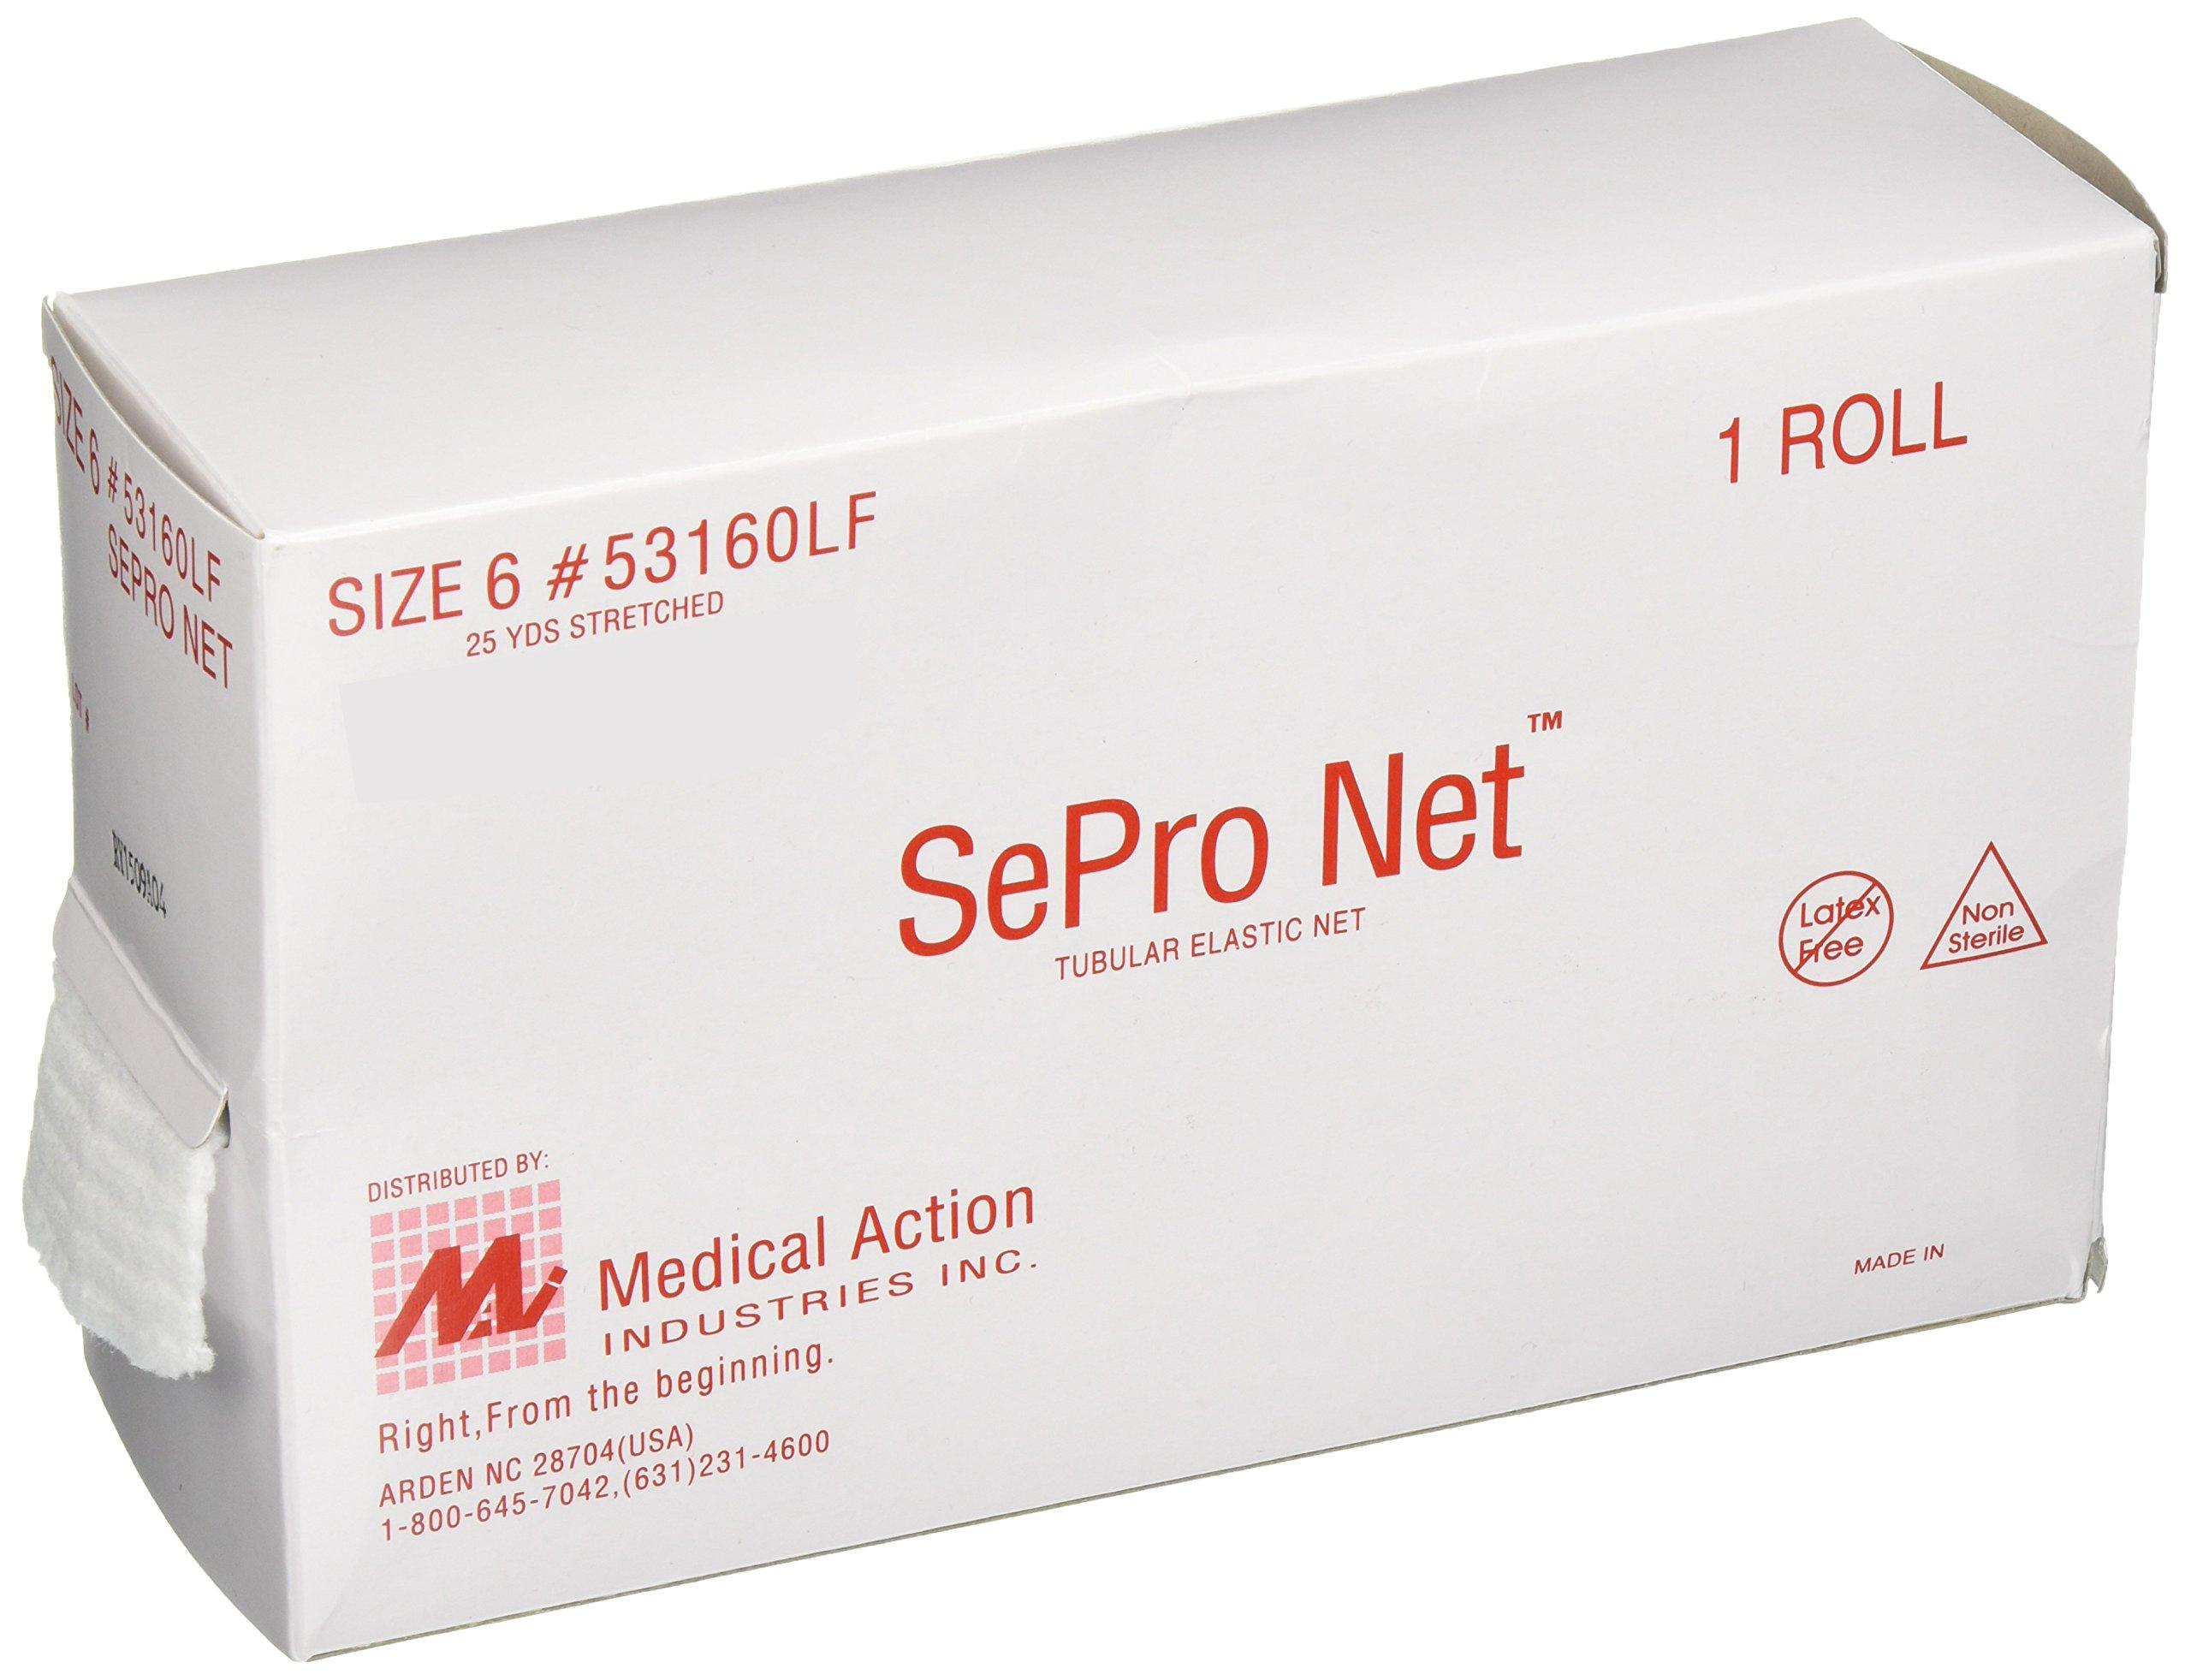 Medical Action Industries 53160LF SePro Elastic Net, Latex Free, Size 6